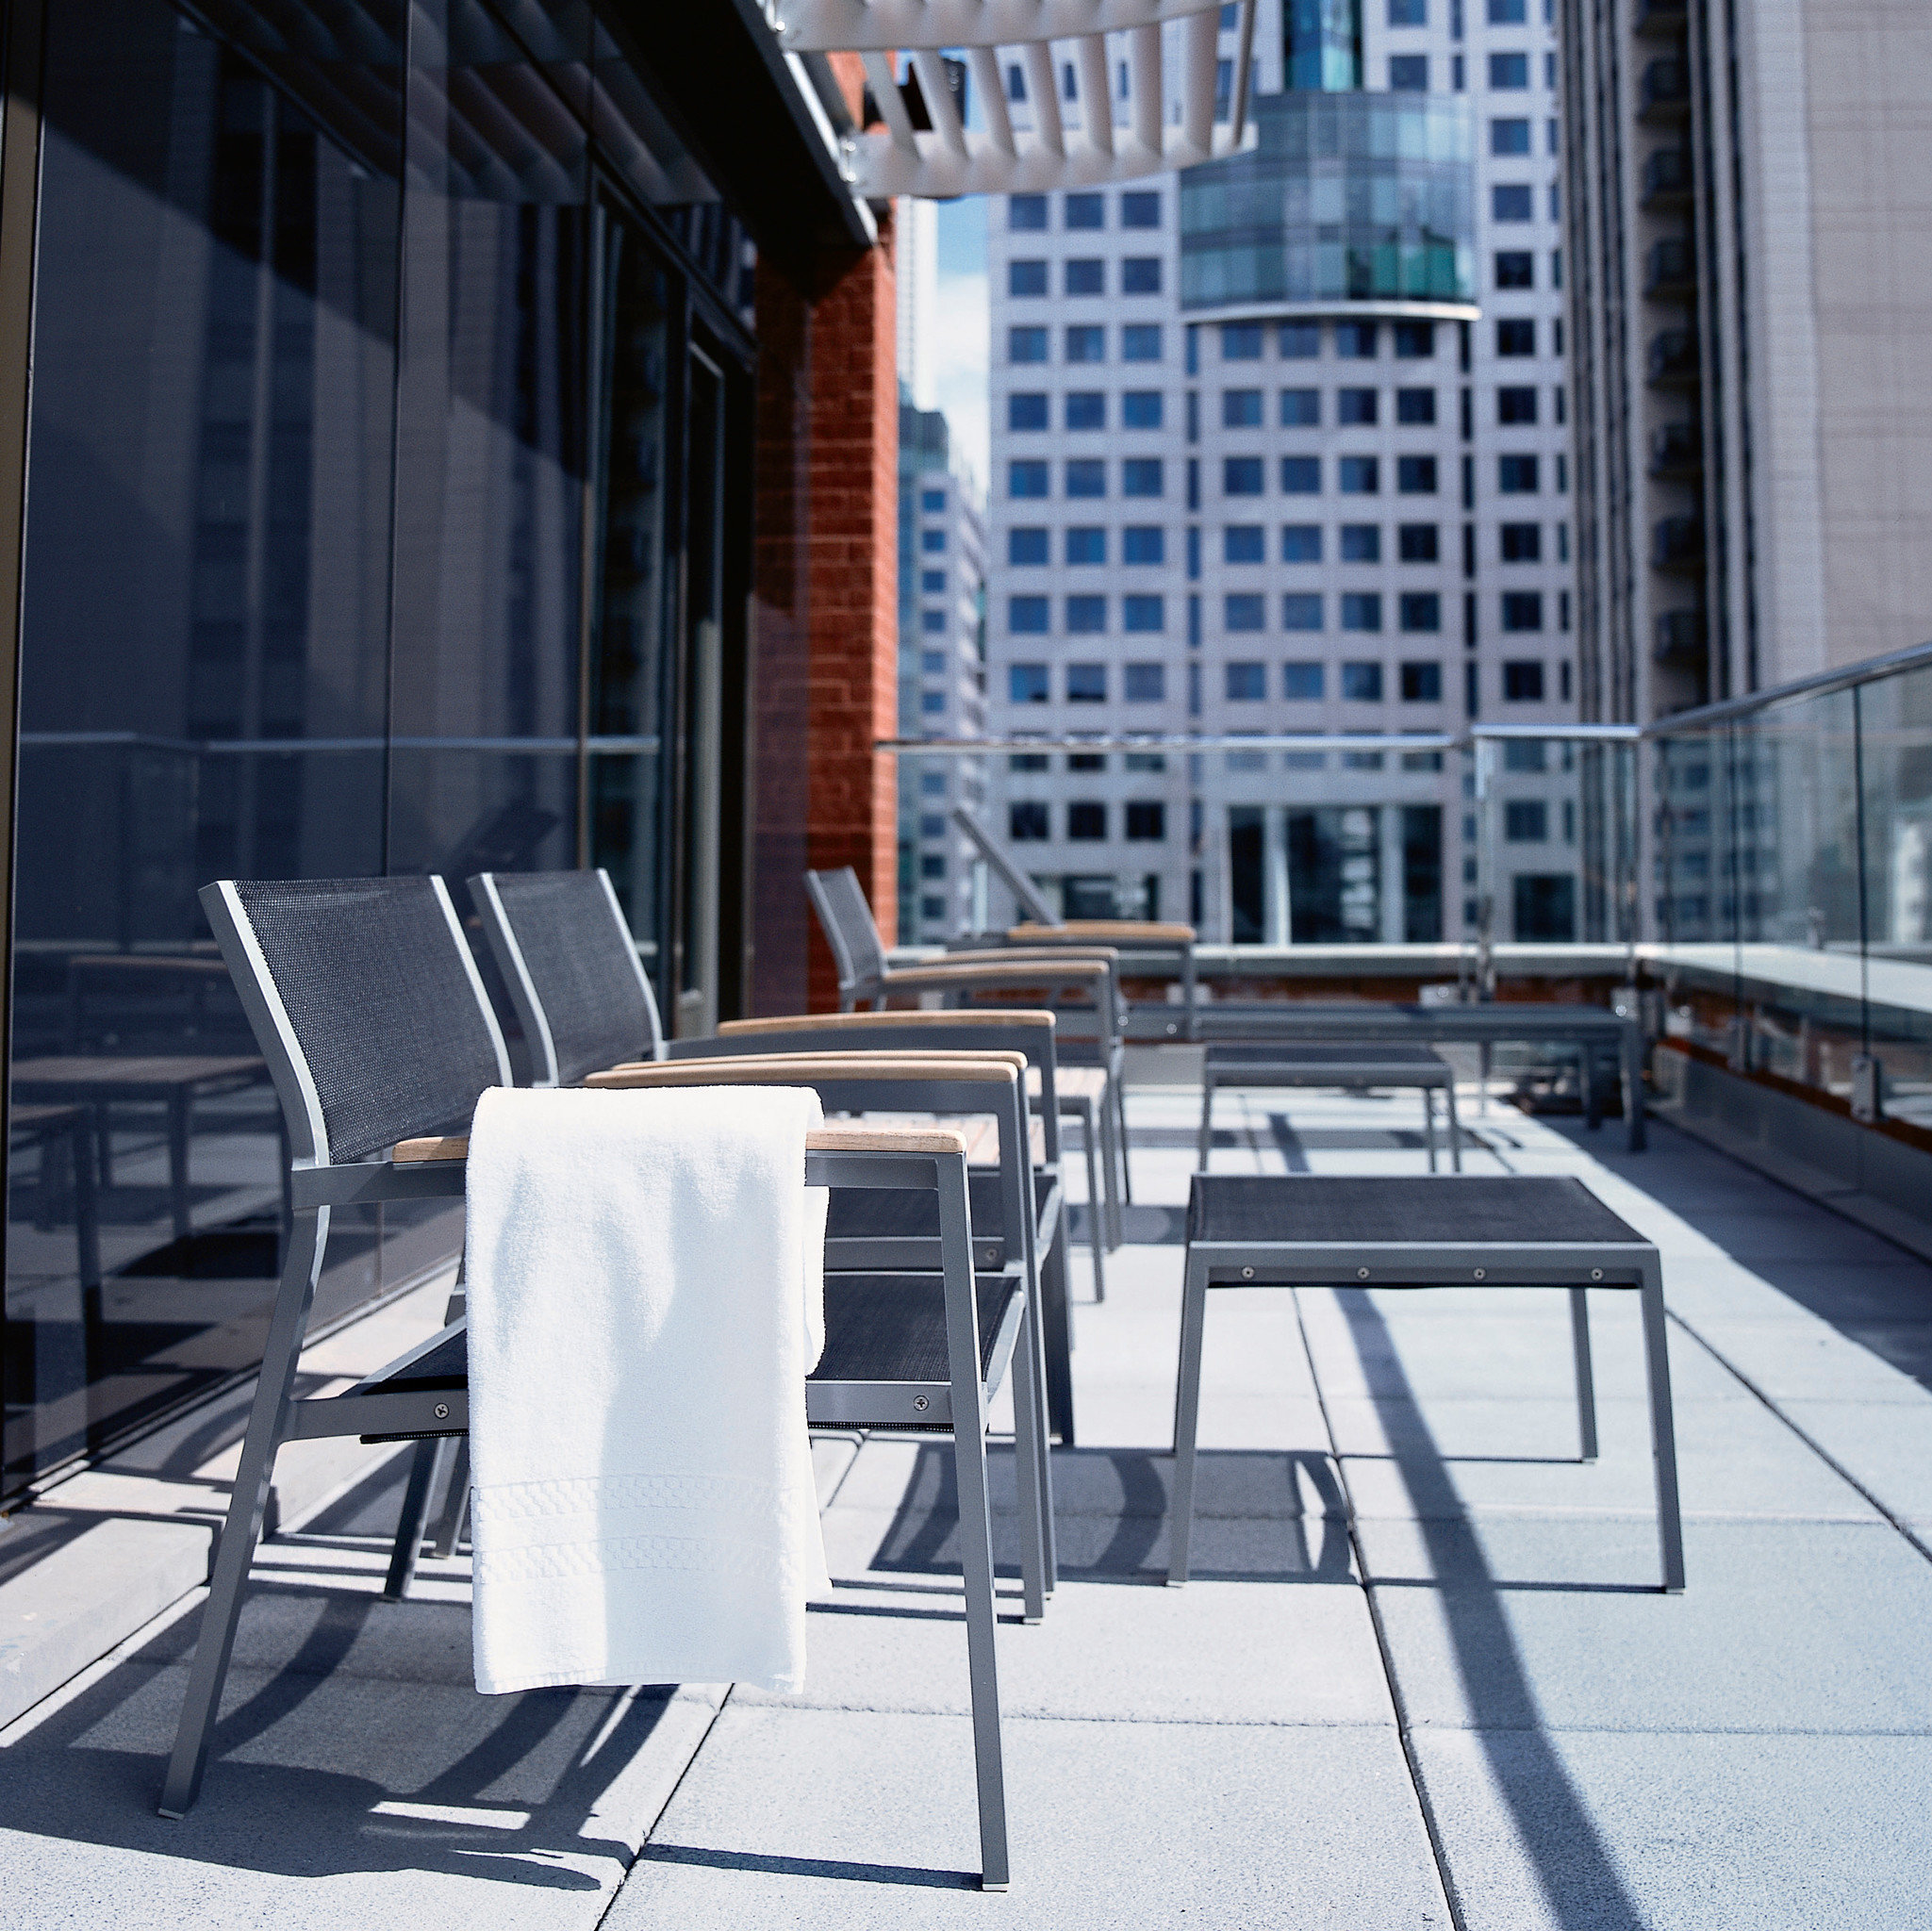 Balcony City Lounge Resort Scenic views building ground chair sidewalk Architecture condominium headquarters set